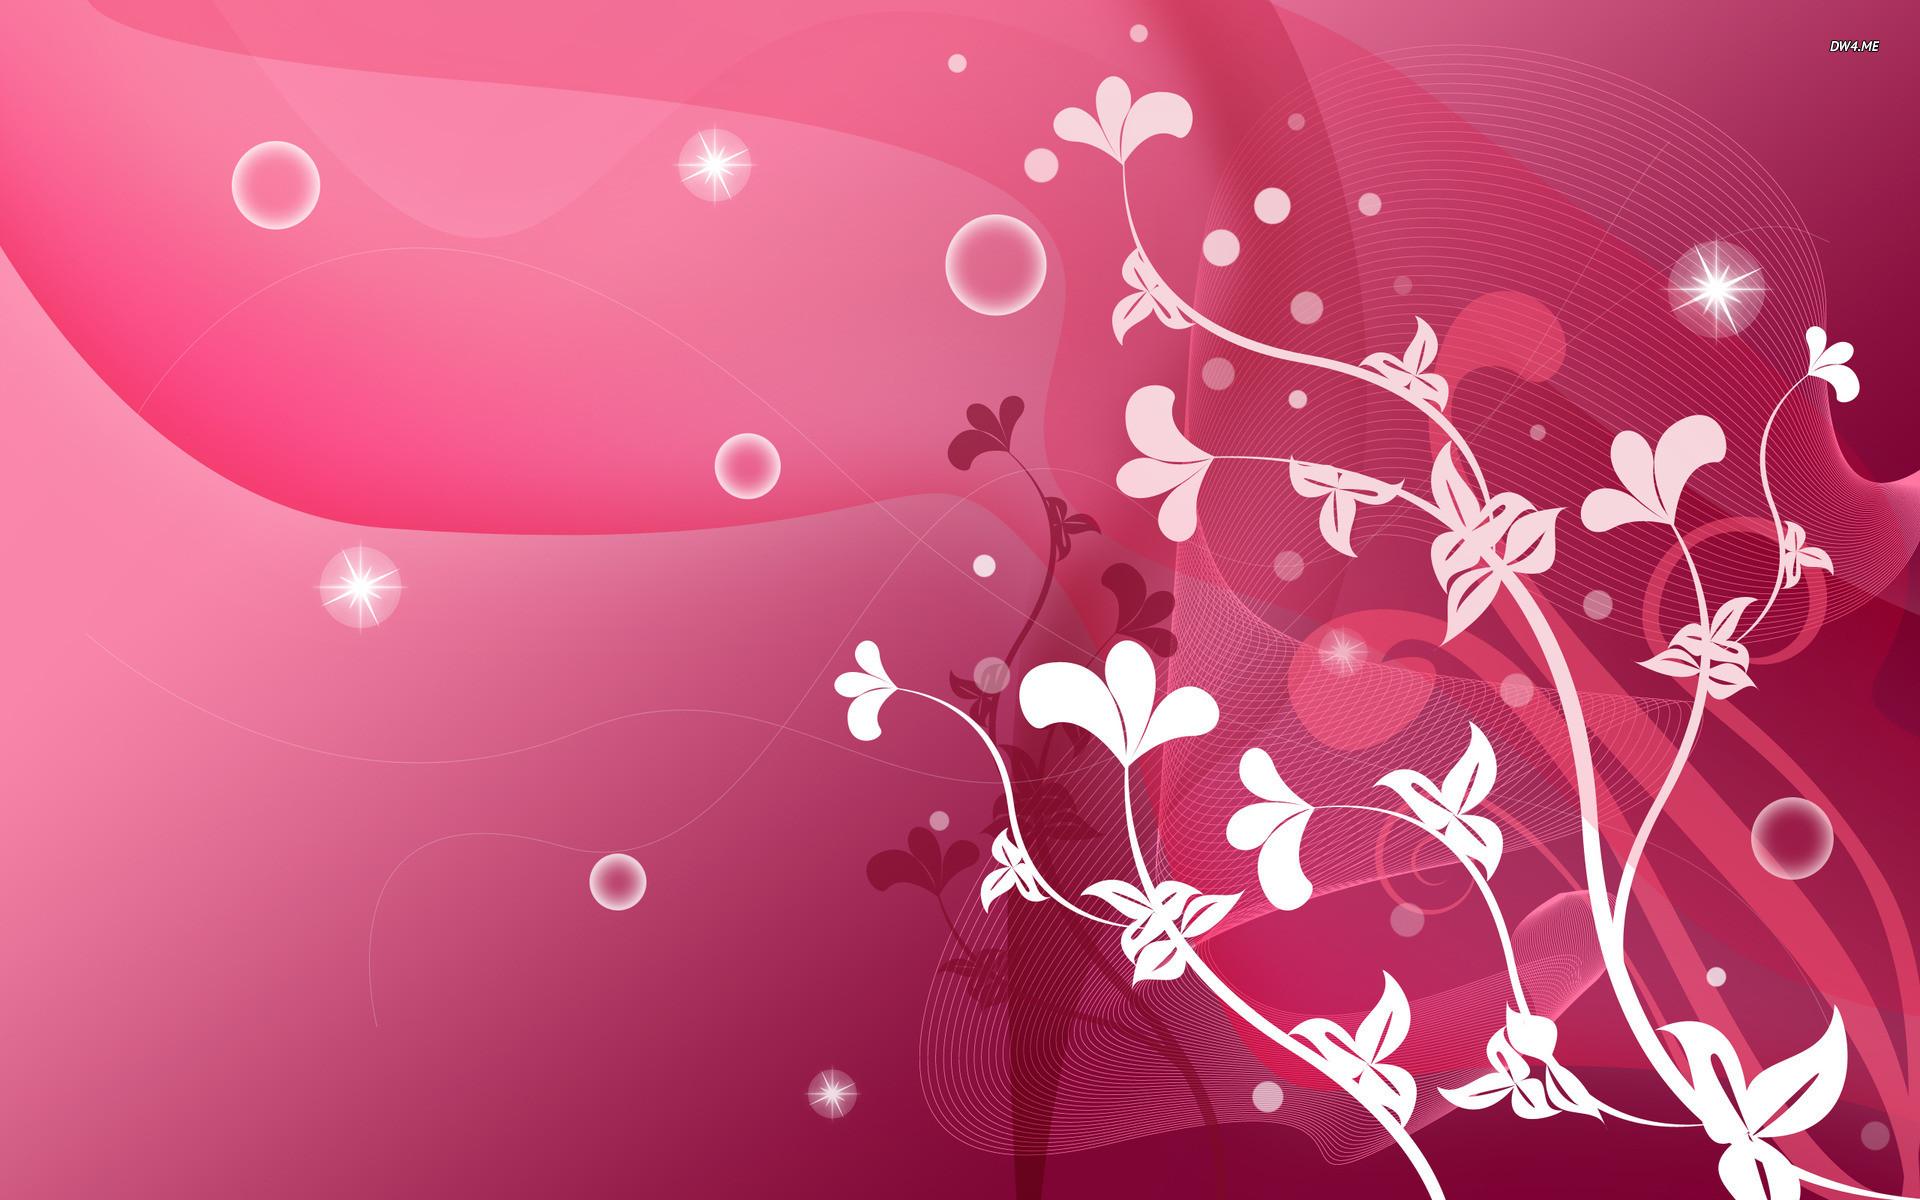 Hot Pink Backgrounds For Desktop 27 Hd Wallpaper